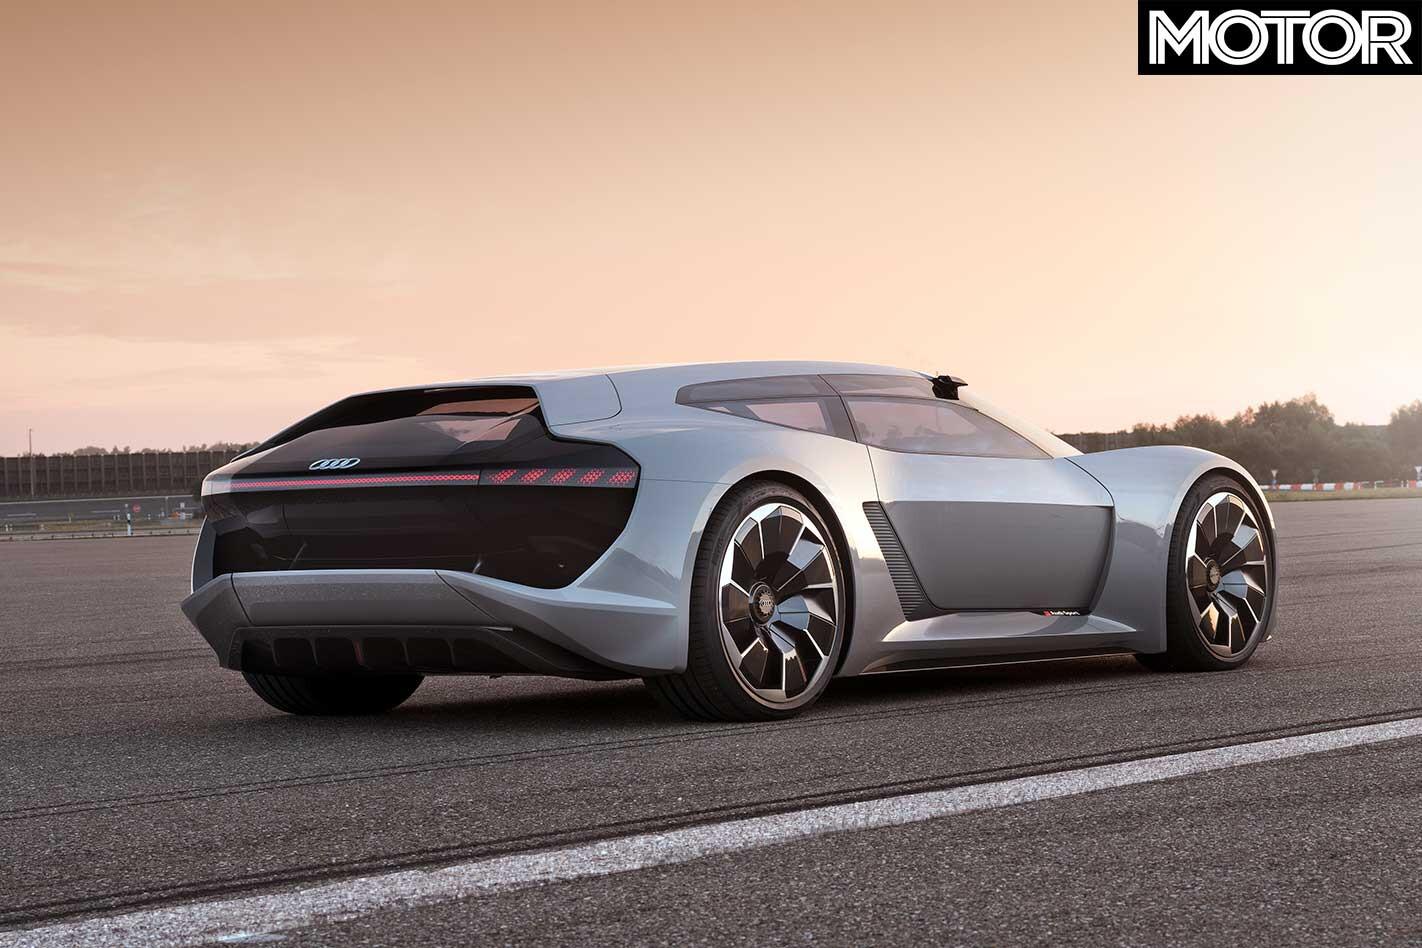 Audi PB 18 E Tron Concept Rear Jpg